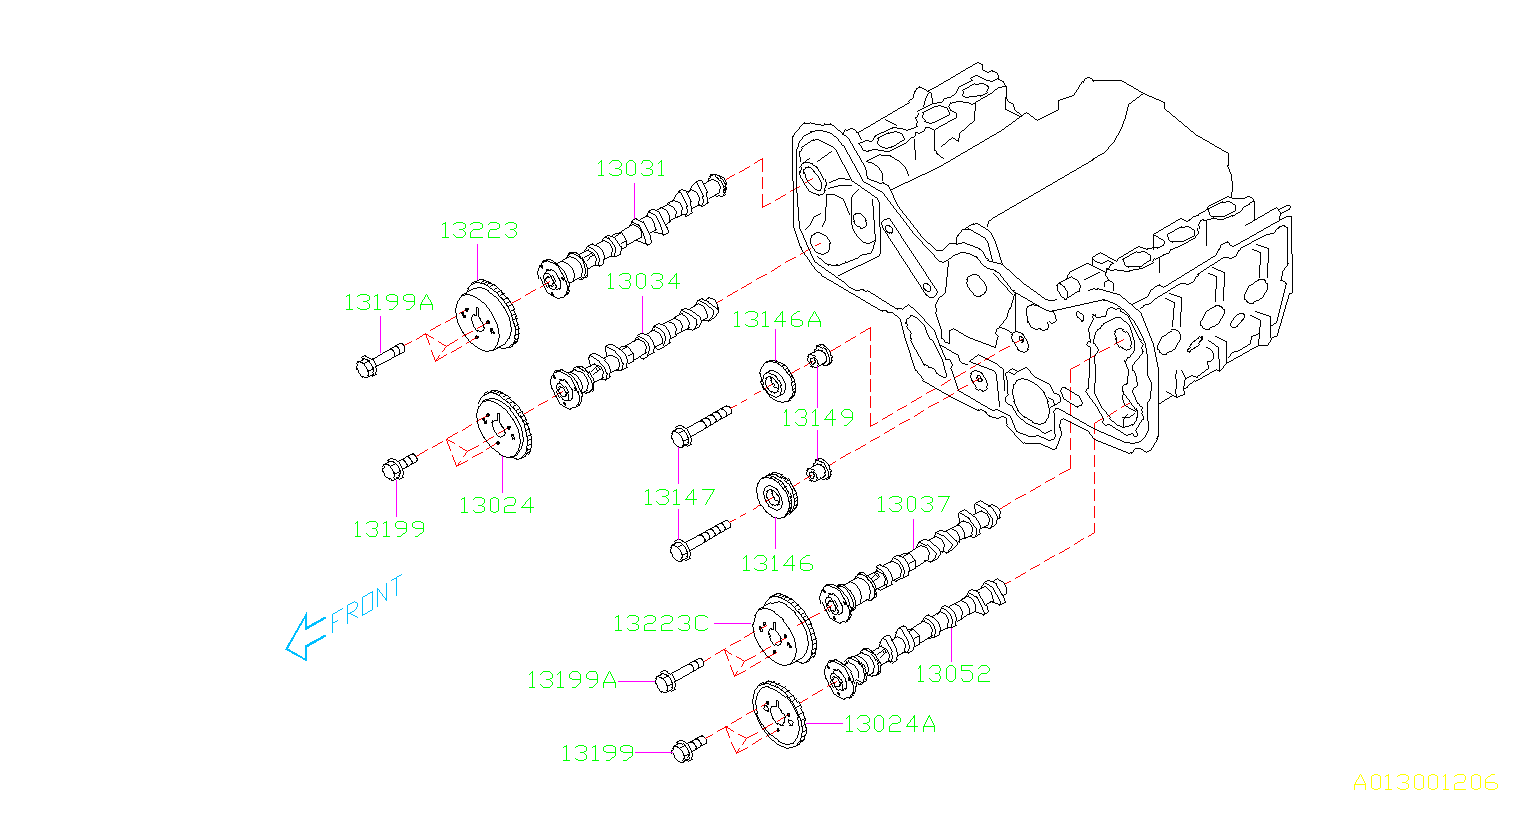 Subaru Legacy Engine Crankshaft Pulley. TIMING, BELT